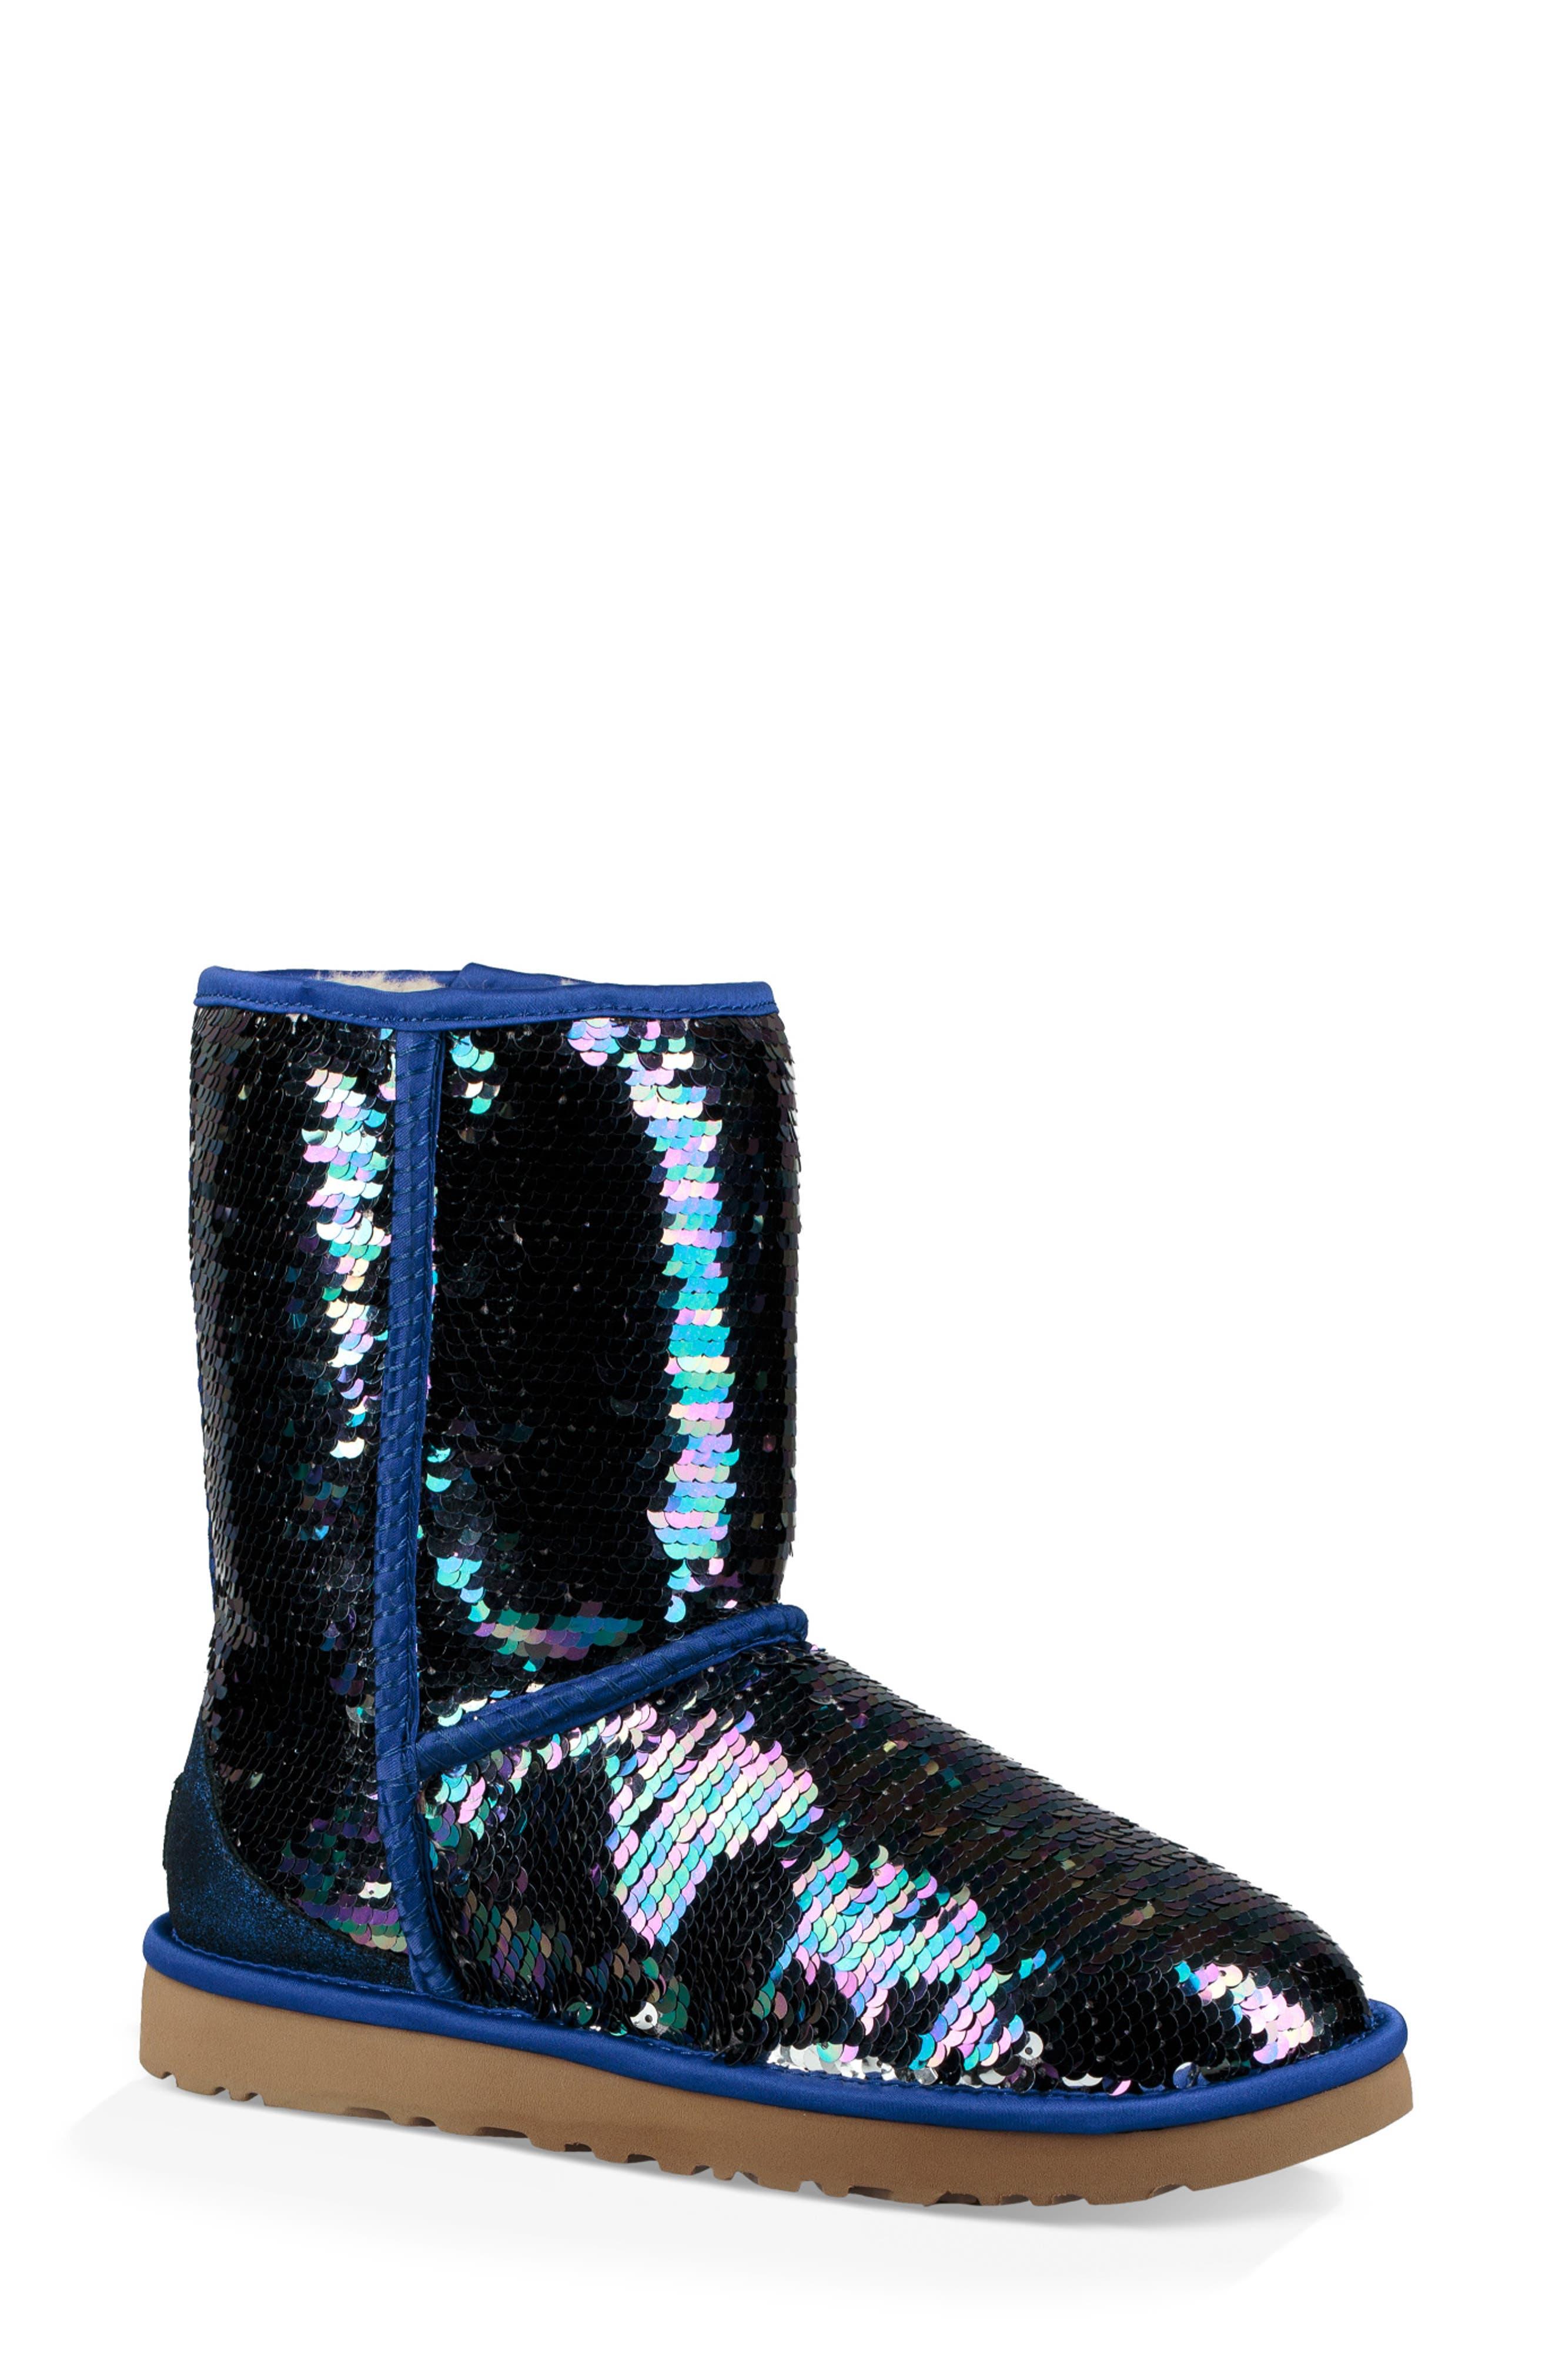 Ugg Classic Short Sequin Boot, Blue